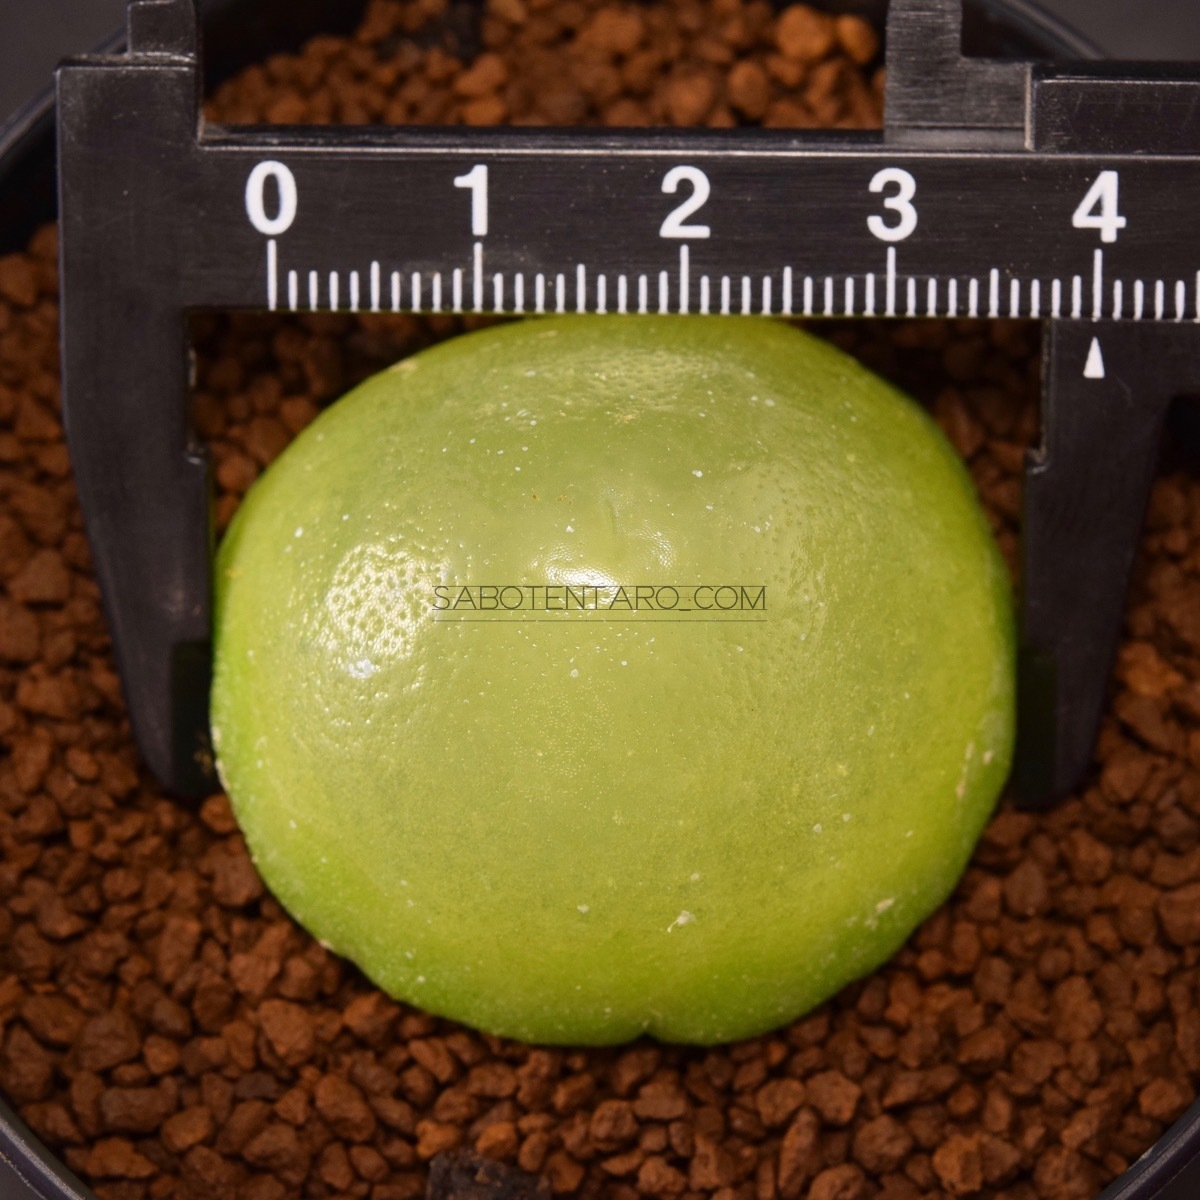 Conophytum brugeri 直径約40mm コノフィツム ブルゲリ 多肉植物 サボテン